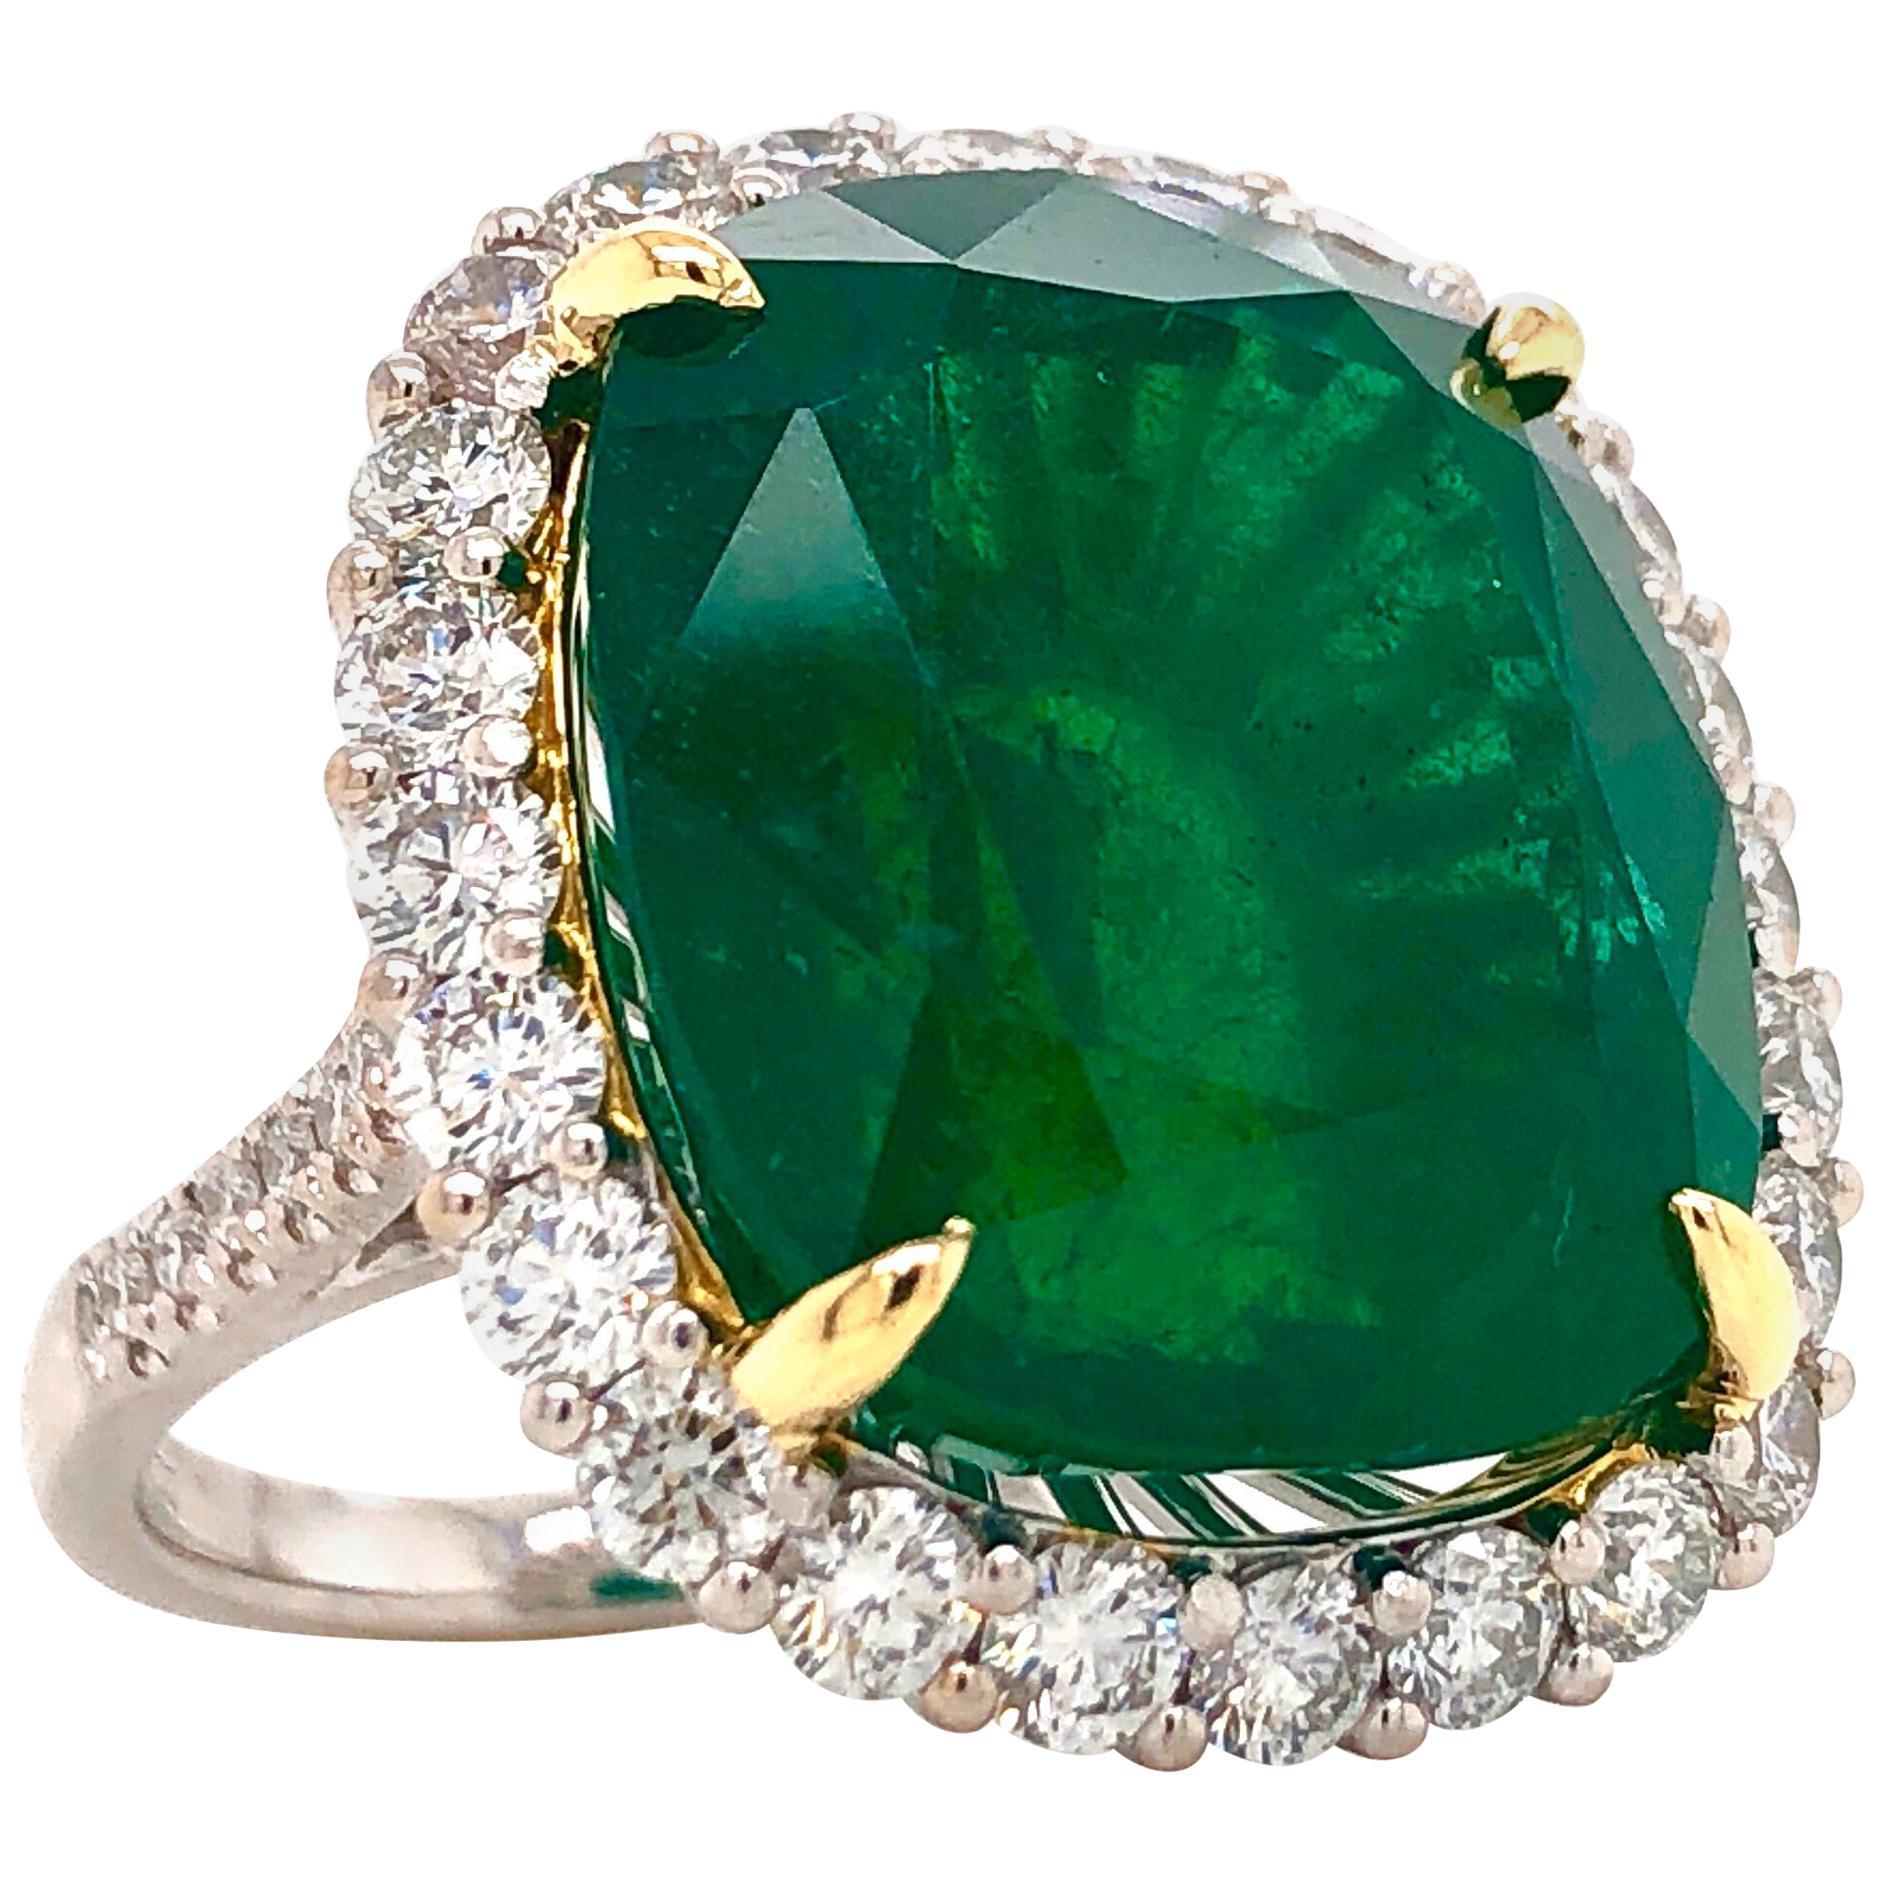 Emilio Jewelry 28.80 Carat Emerald Diamond Ring